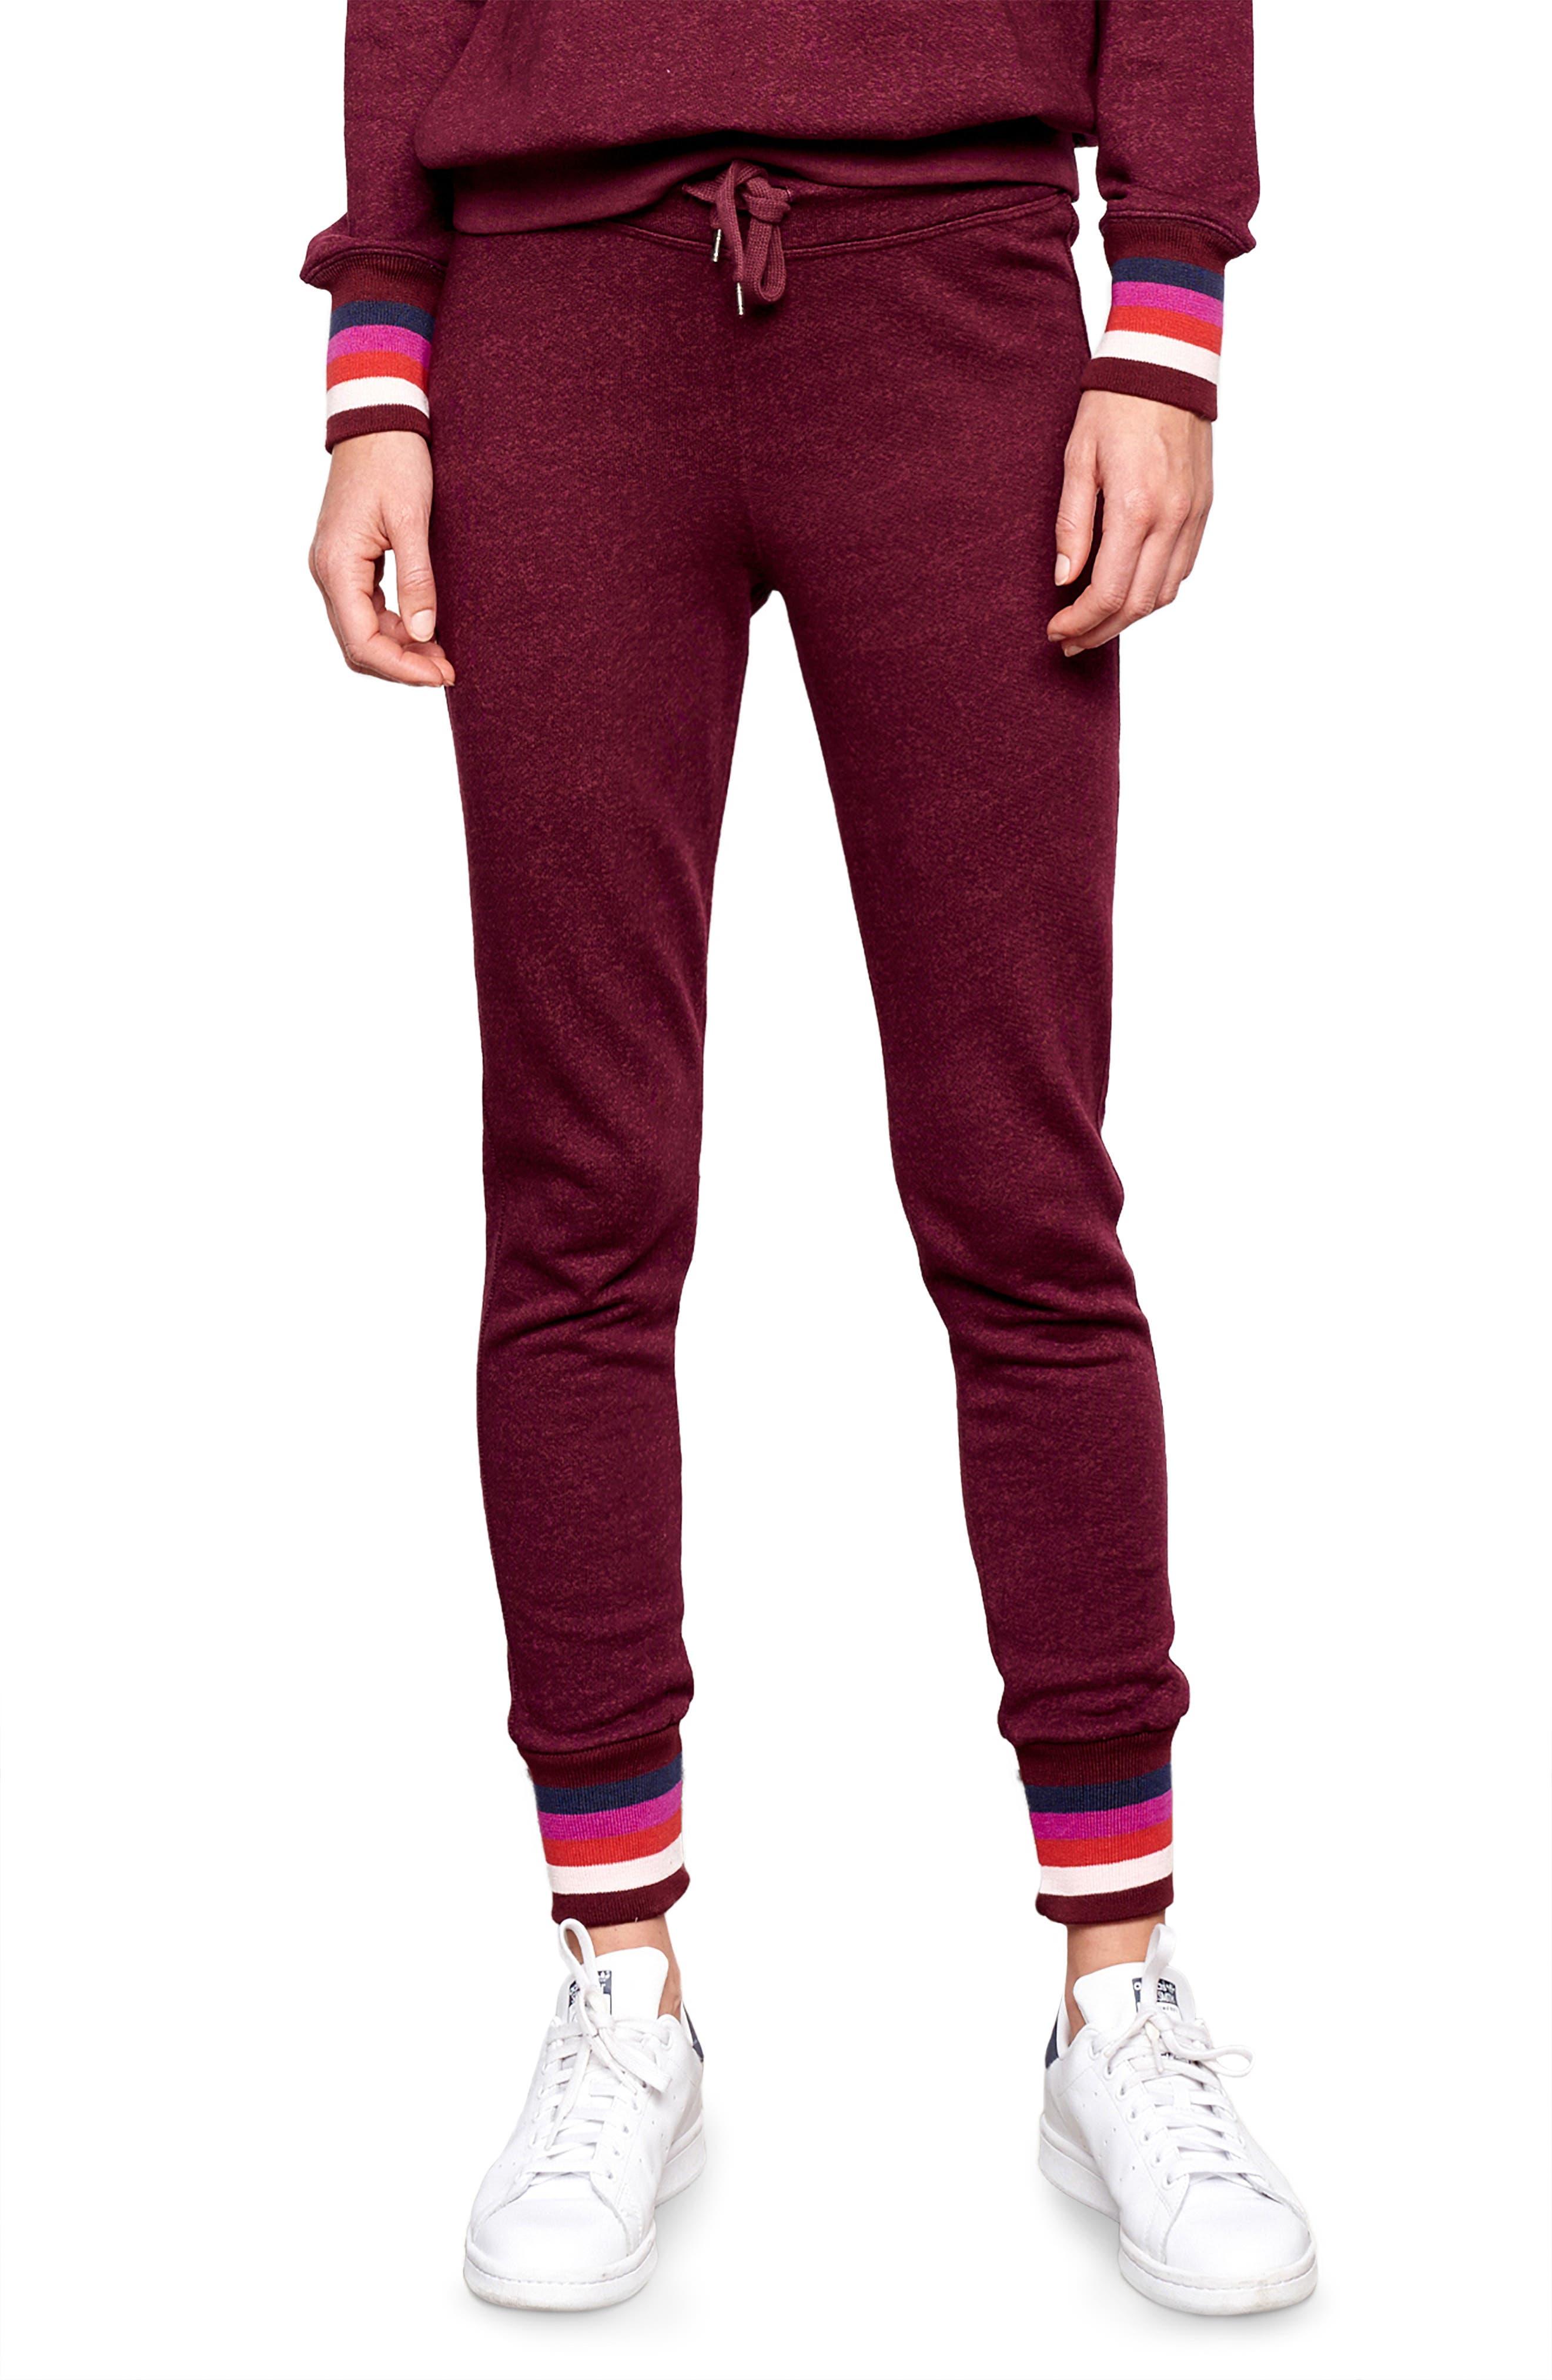 Stripe Cuff Sweatpants,                             Main thumbnail 1, color,                             930